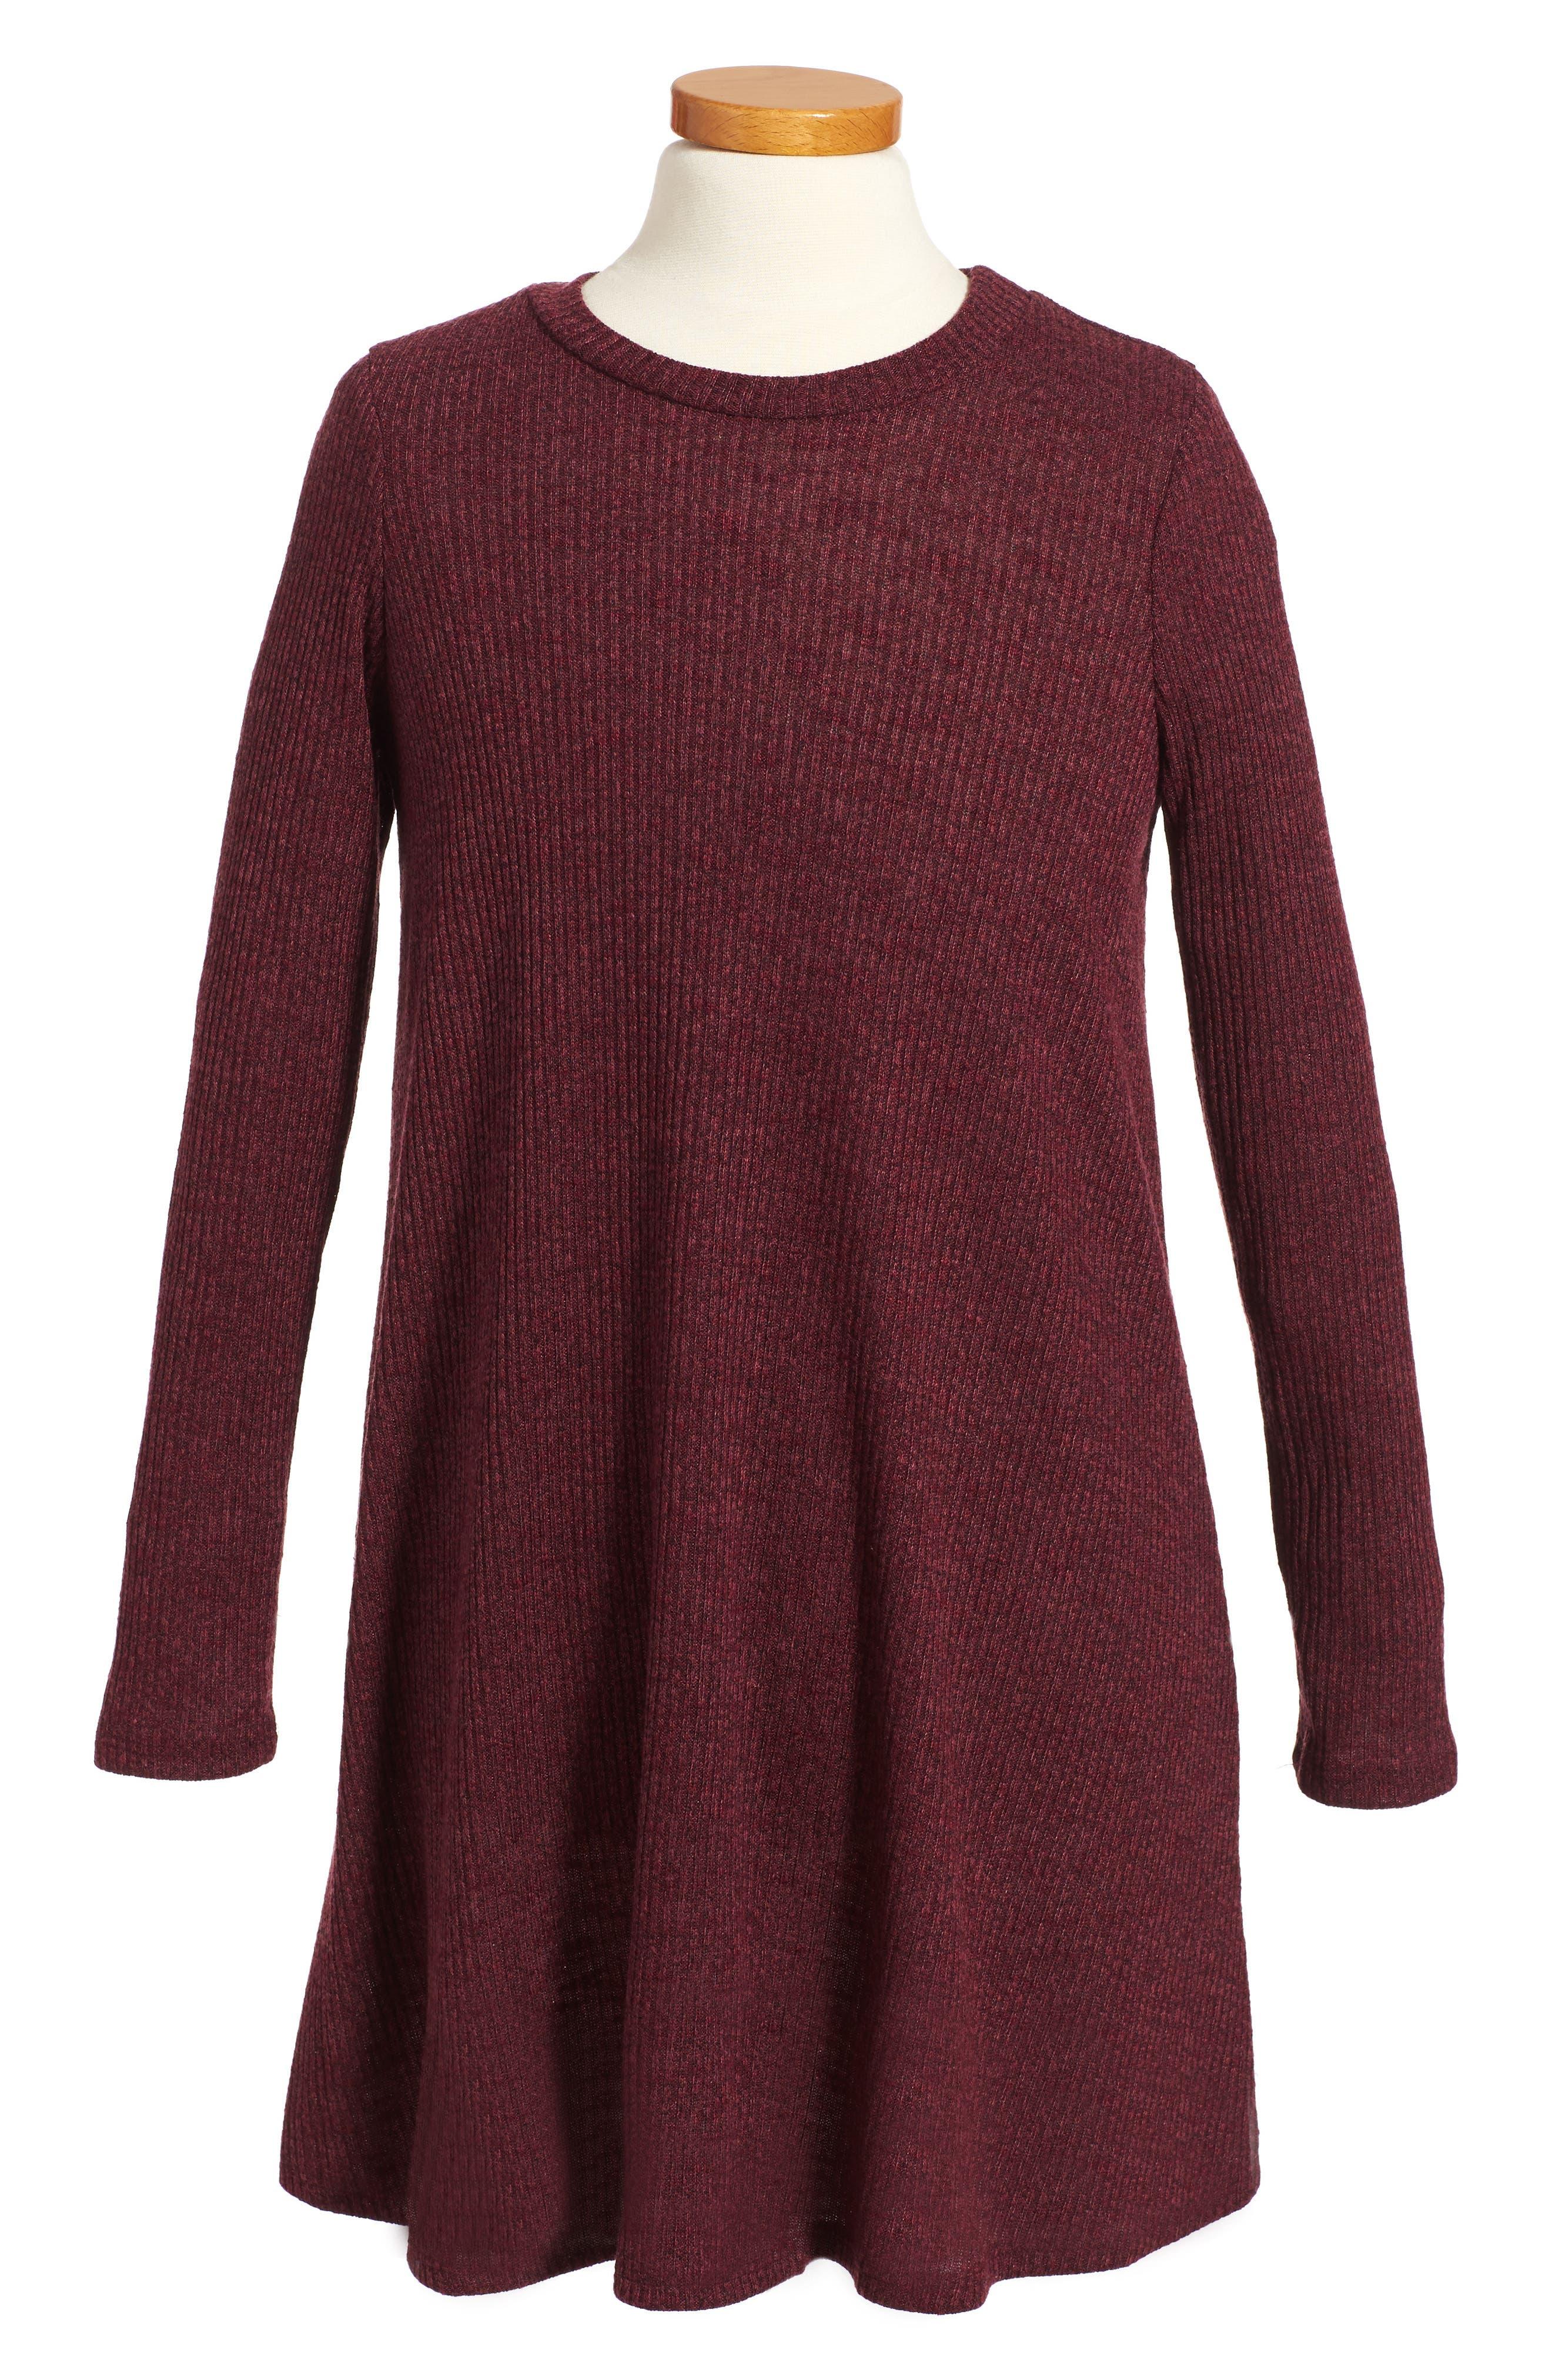 Main Image - Soprano Rib Knit Sweater Dress (Big Girls)